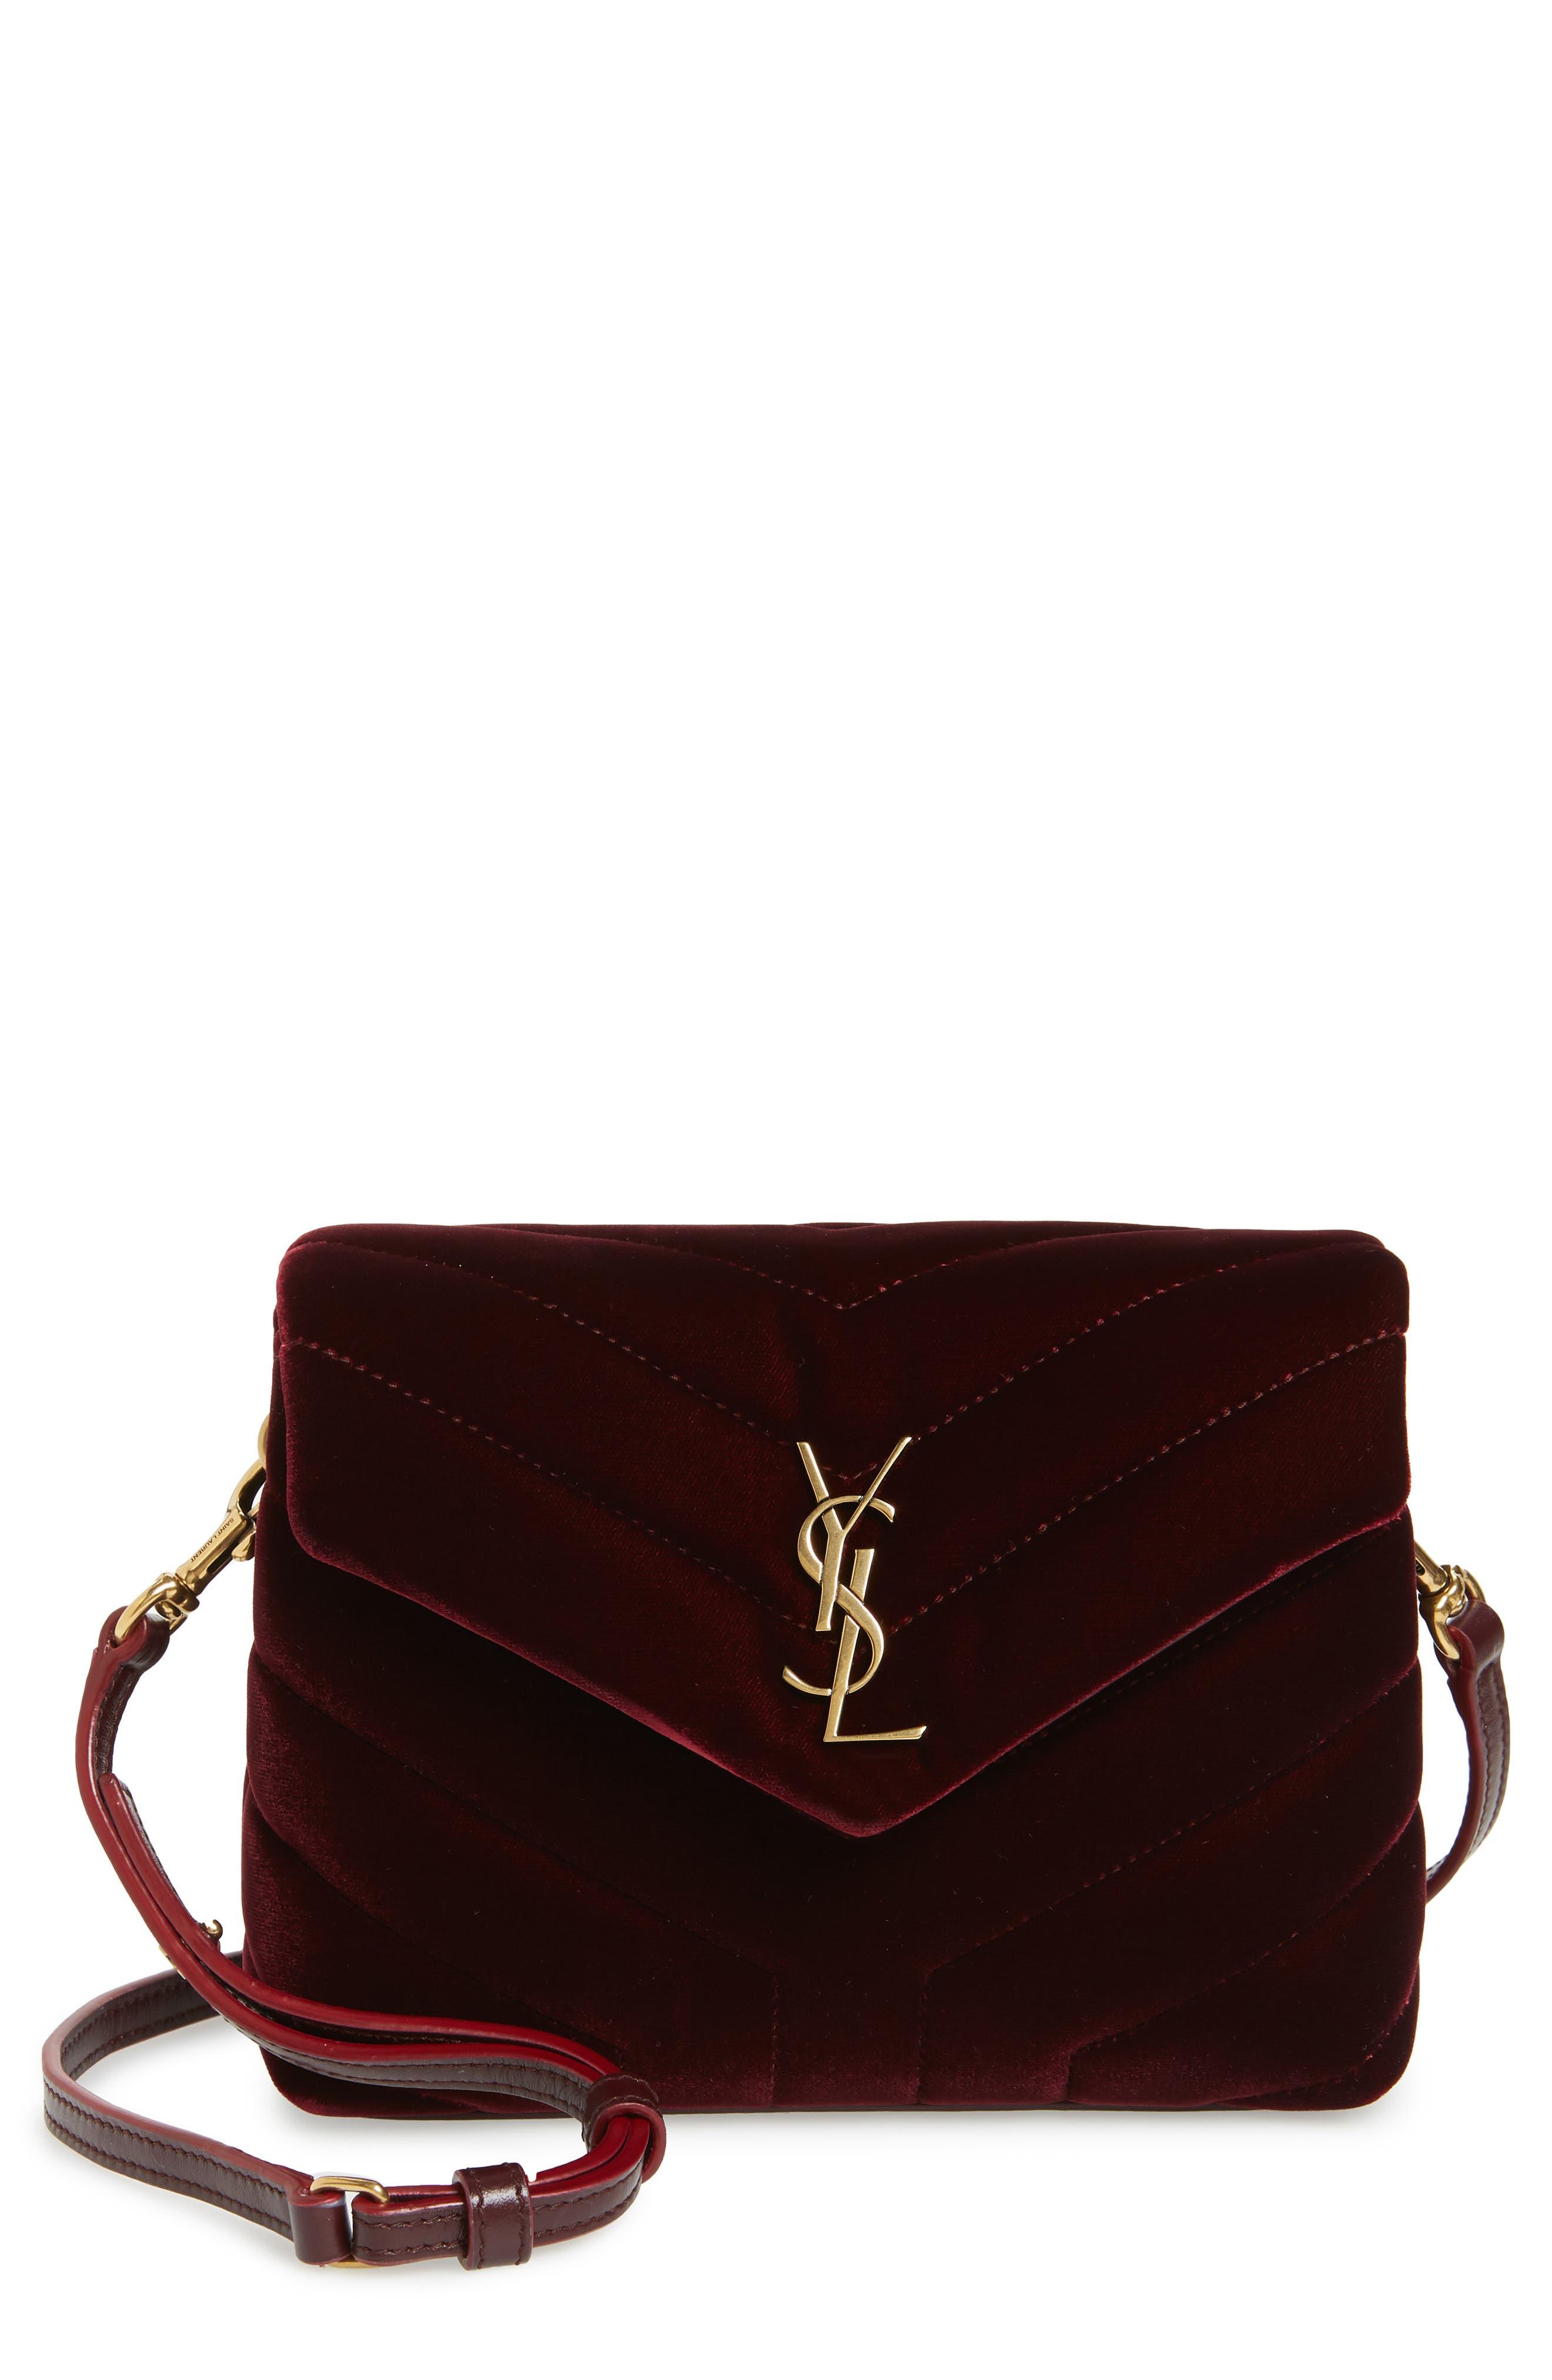 Toy Loulou Velvet Crossbody Bag,                             Main thumbnail 1, color,                             930